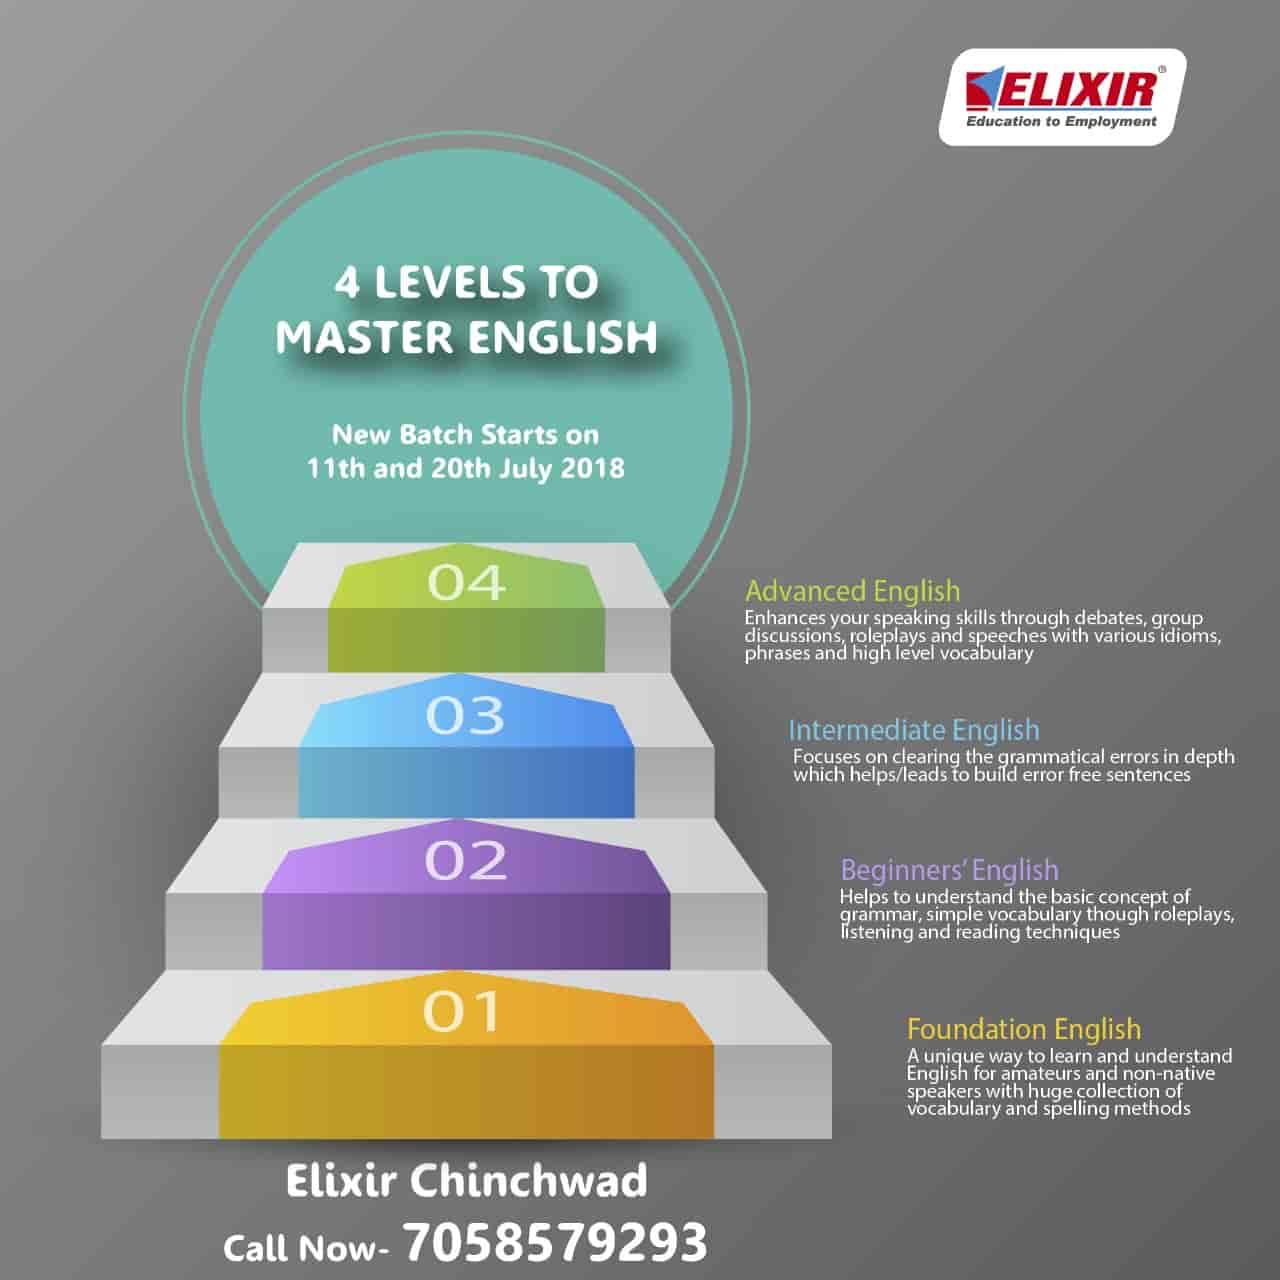 Elixir Training Services Pvt Ltd, Chinchwad - Language